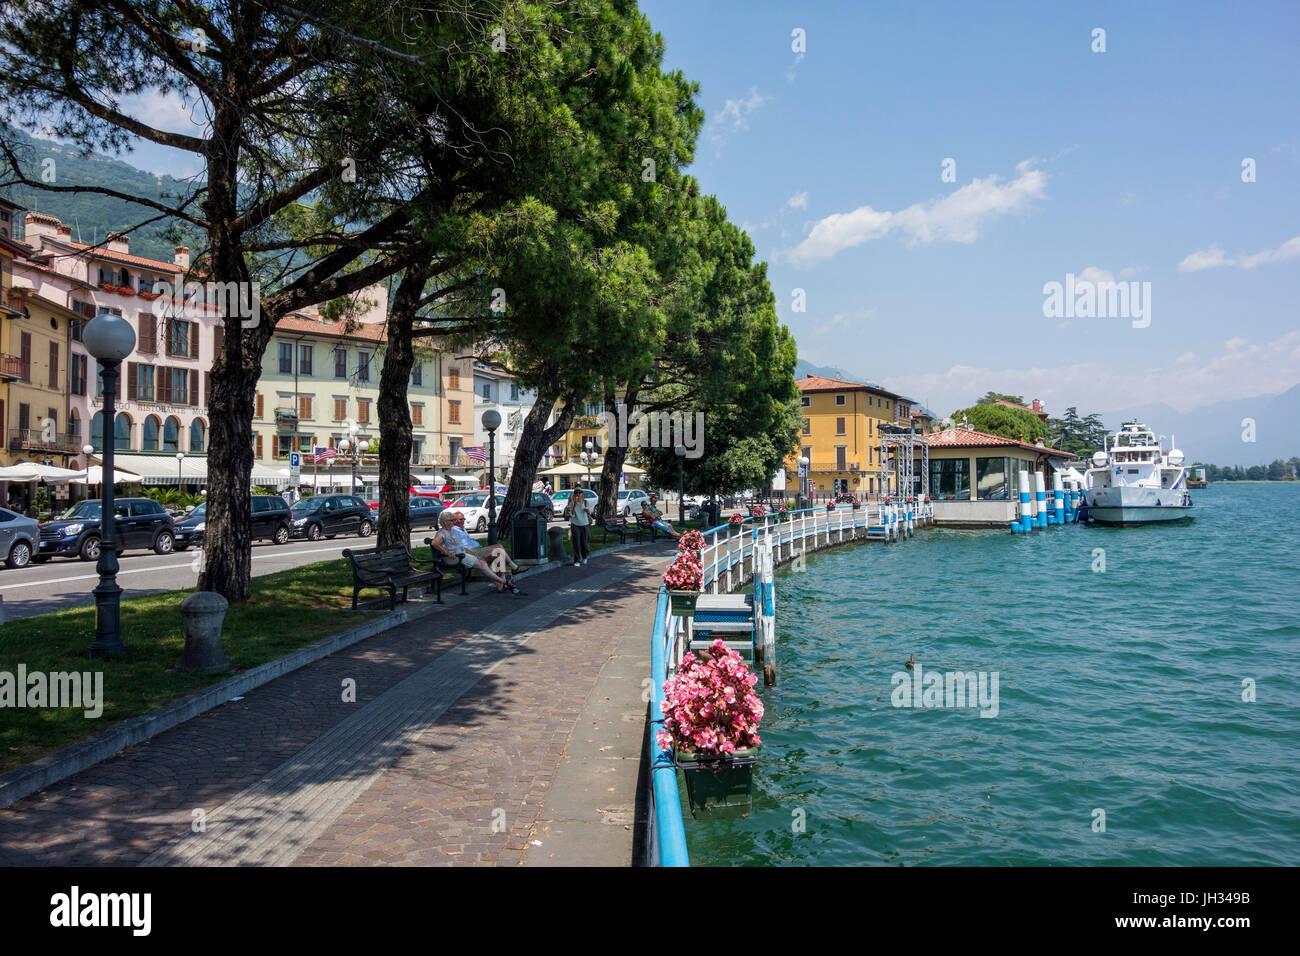 Lovere, Lago Iseo, Italy - Stock Image